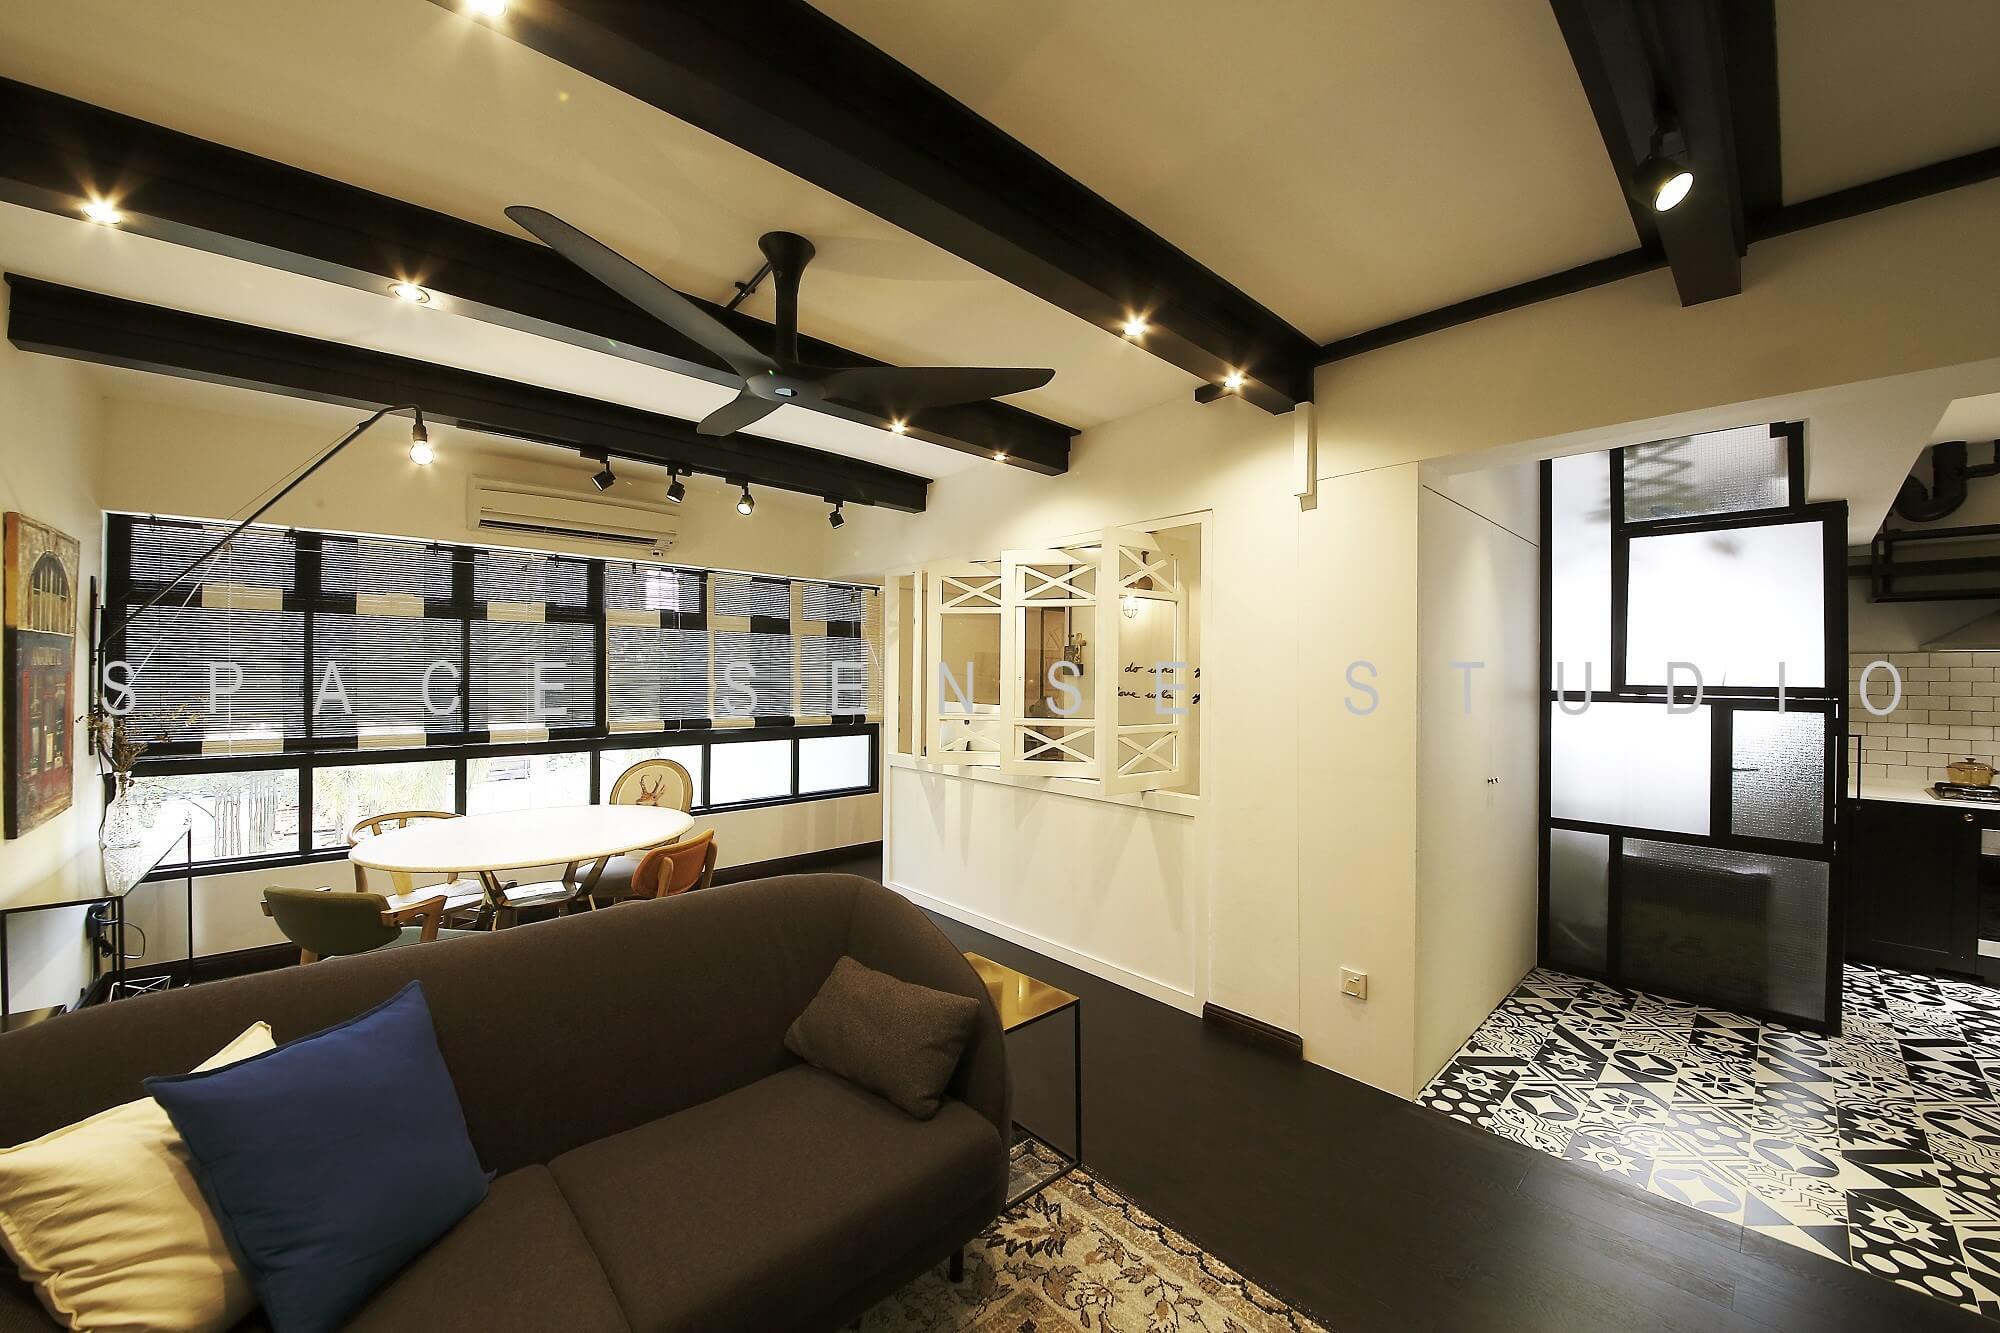 Design Tips for Small Homes from Popular Interior Designers- Lamp vs Overhead Light